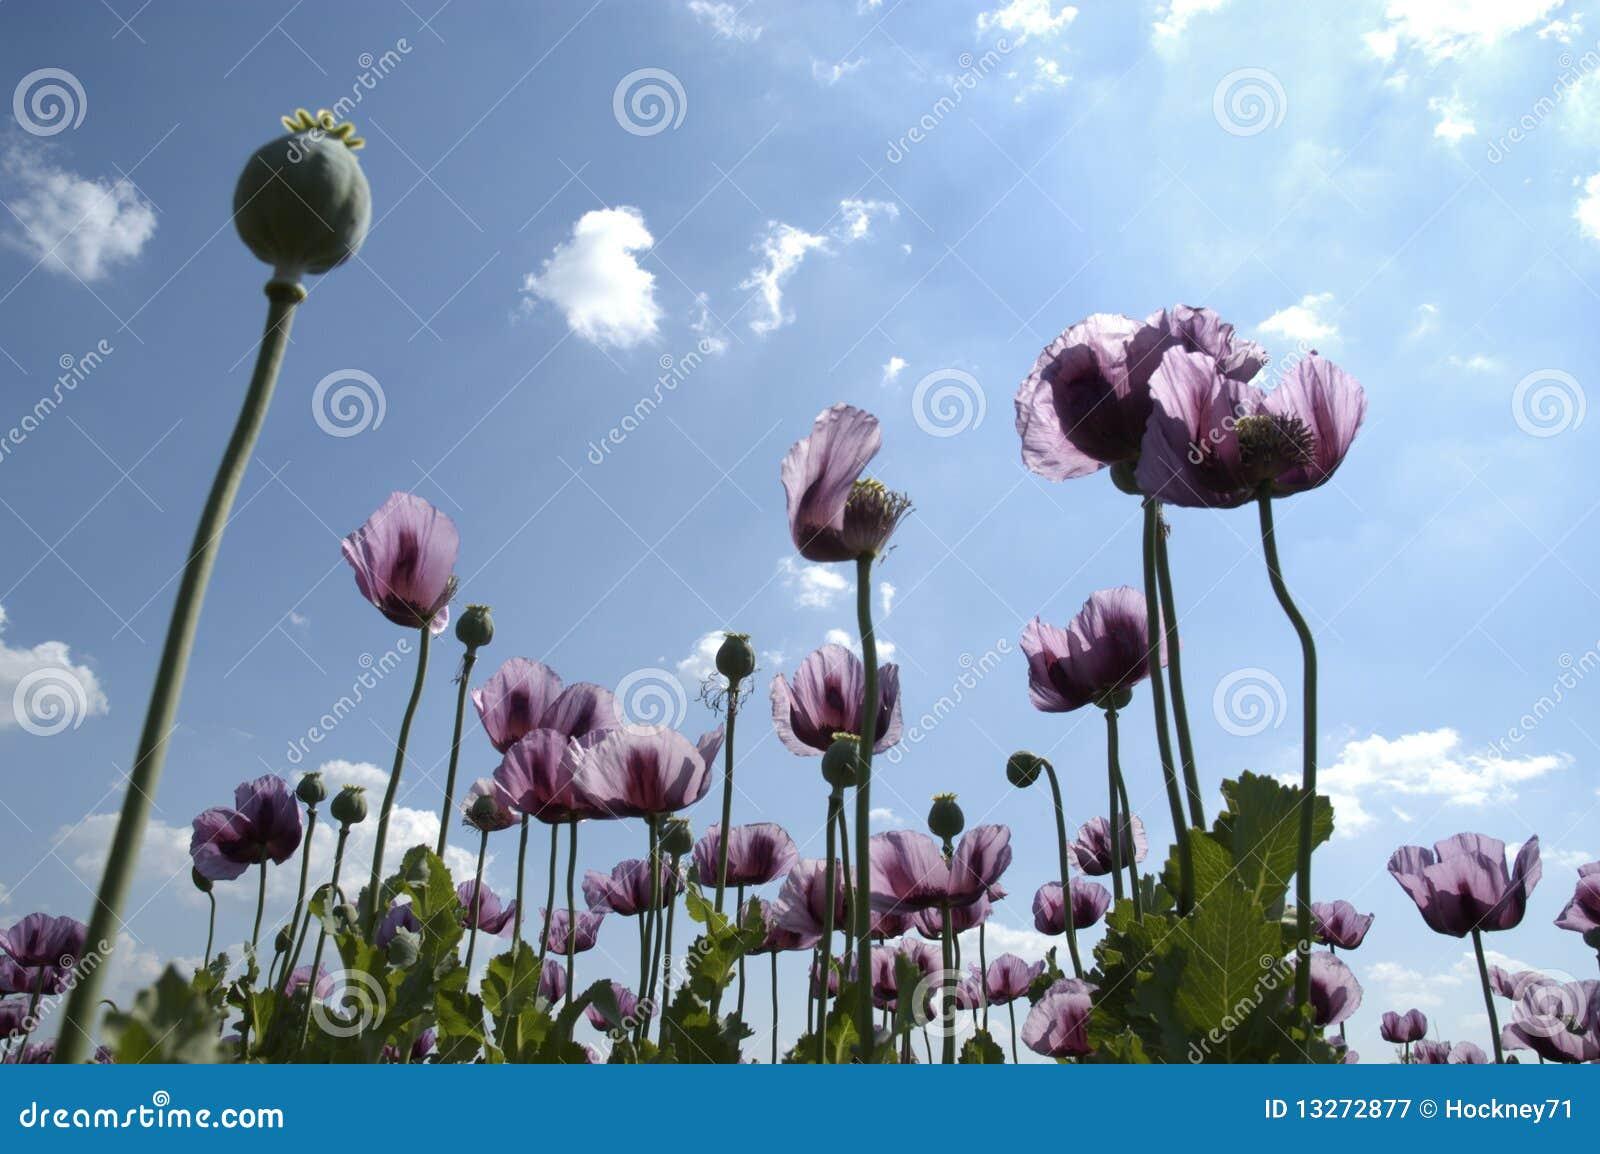 Tall Purple Flowers Stock Photography Cartoondealer Com